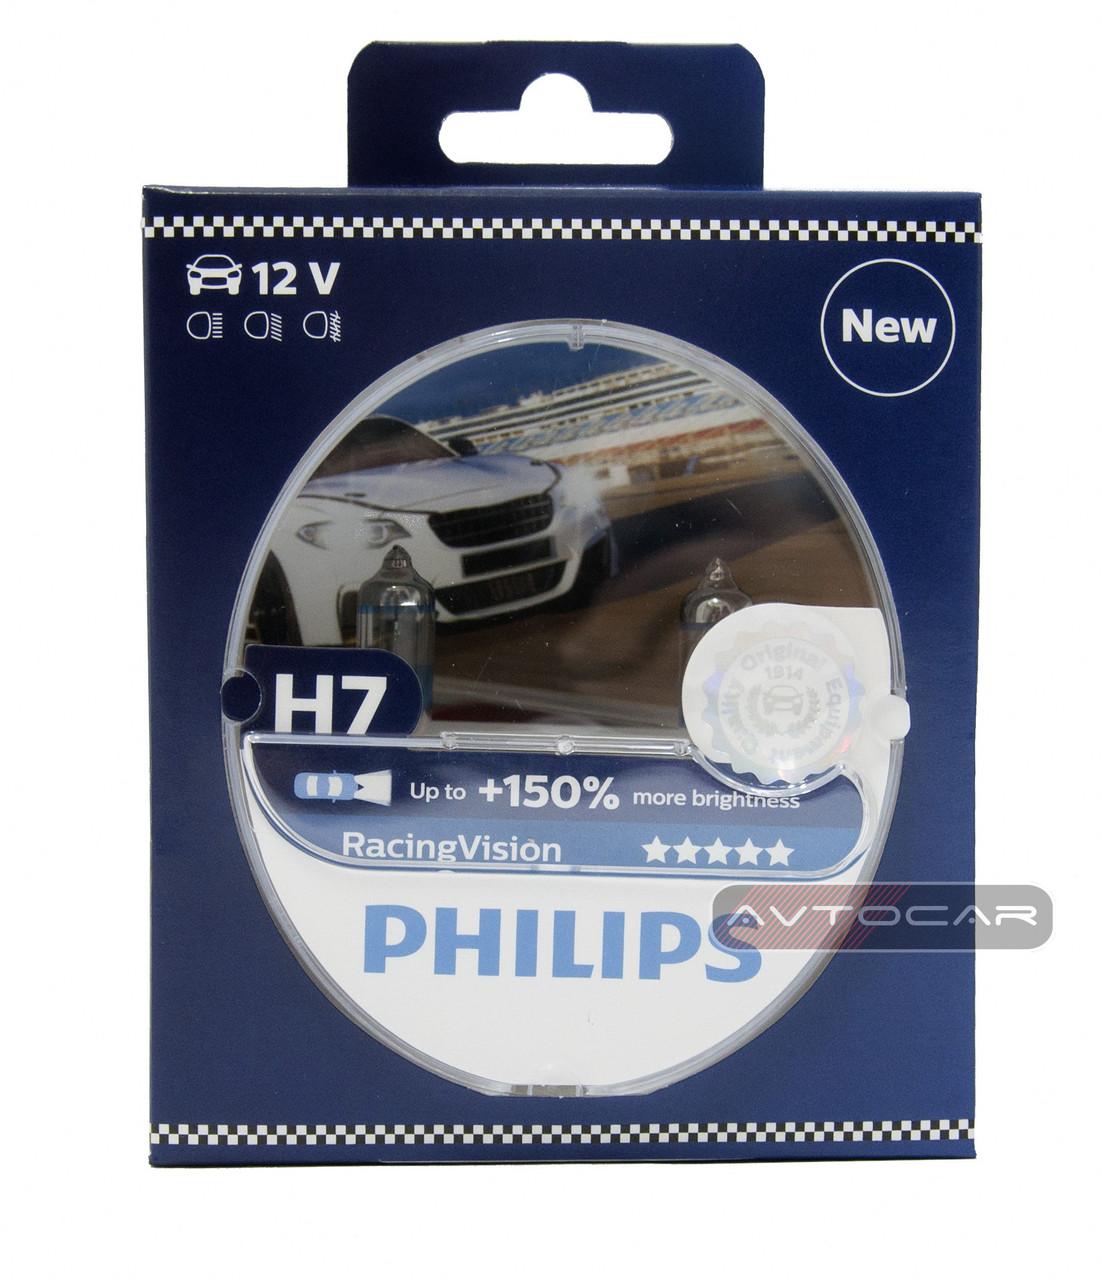 philips racingvision 150 h7 2. Black Bedroom Furniture Sets. Home Design Ideas